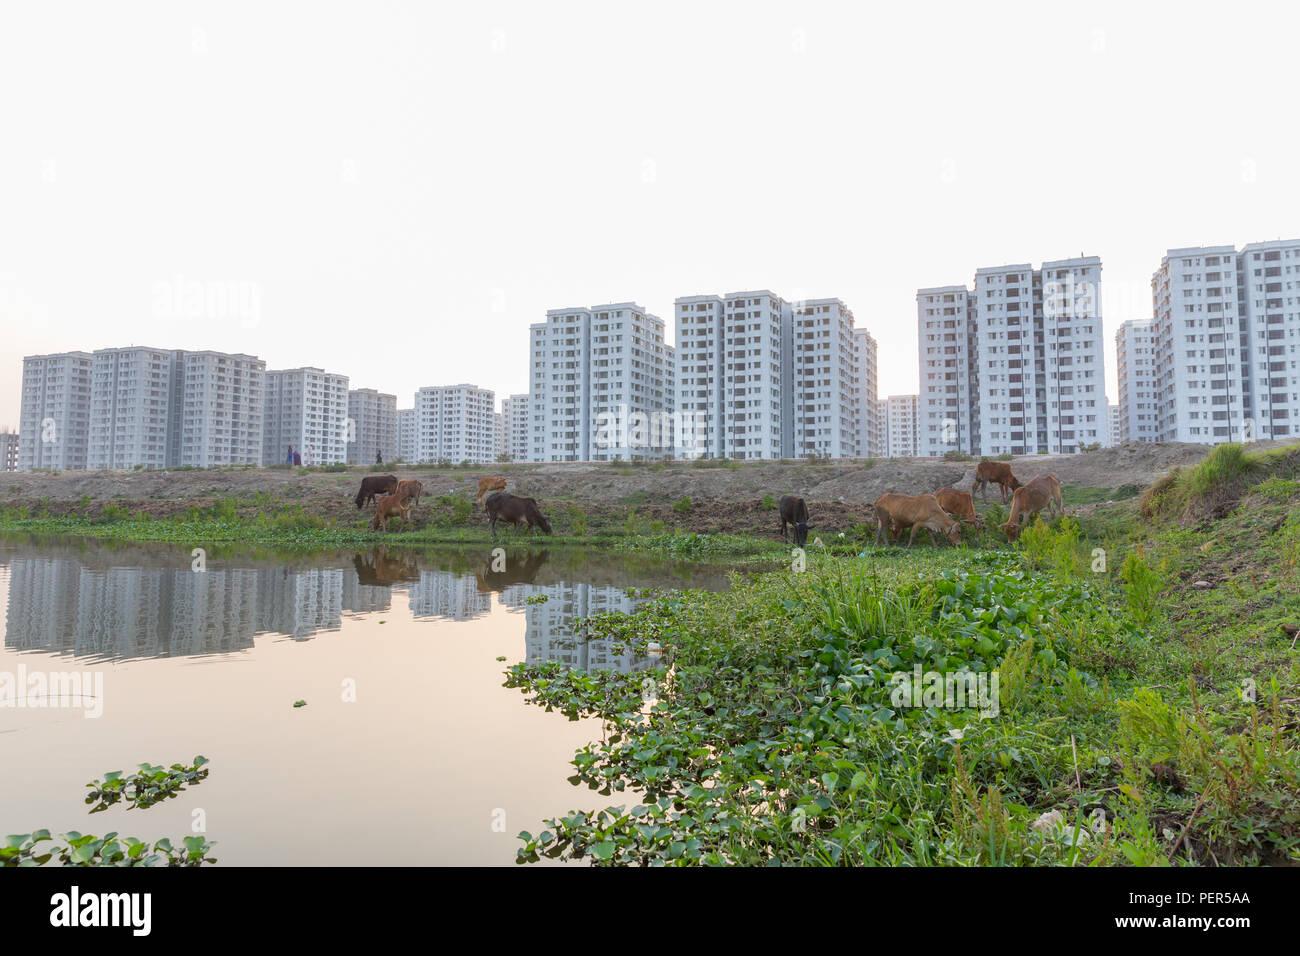 Desparate Urbanigation, Dhaka, Bangladesh - Stock Image